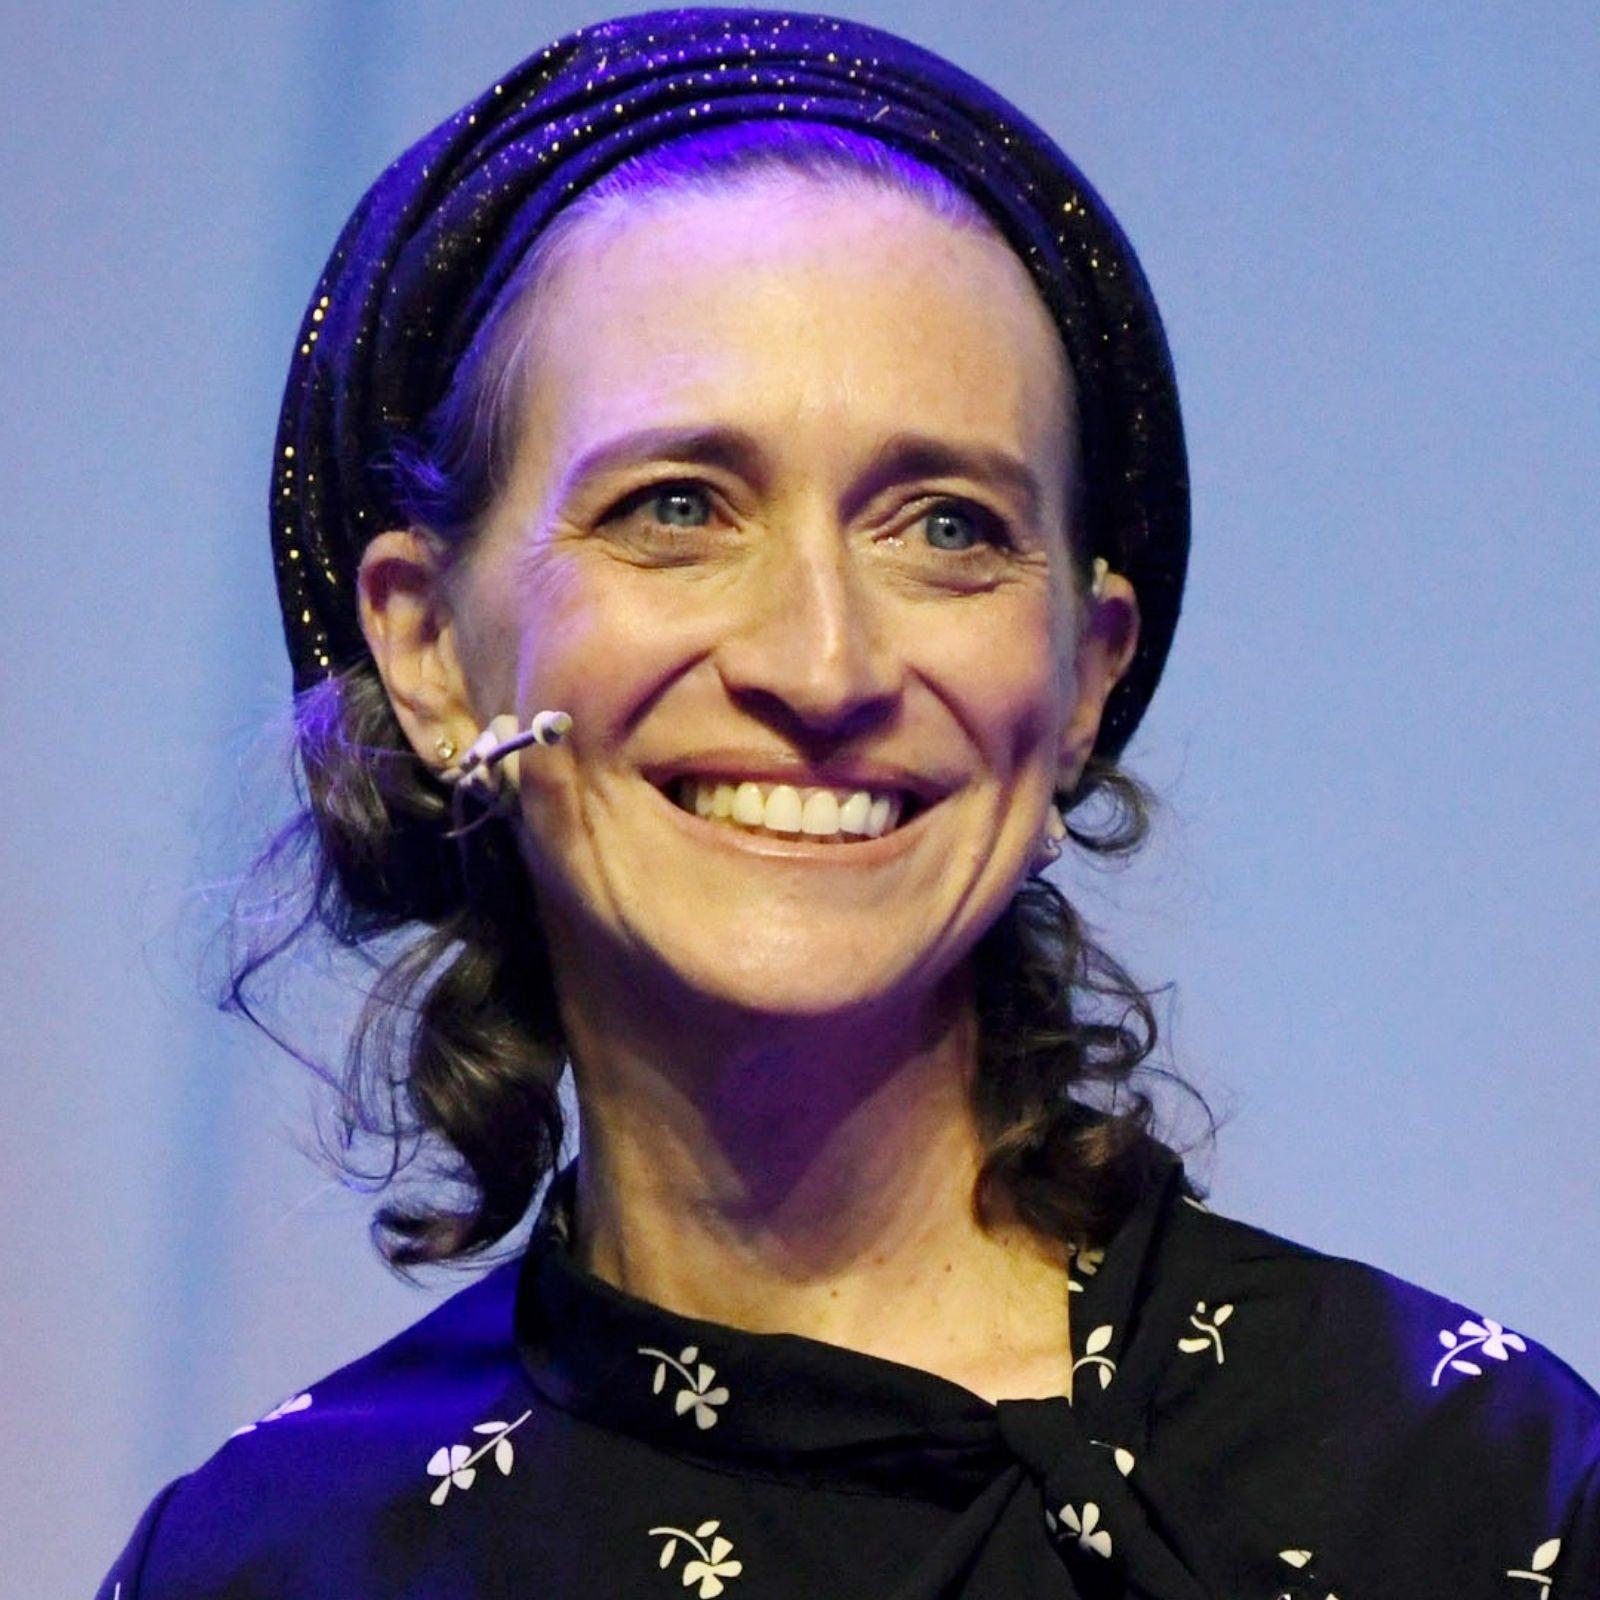 Rabbanit Michelle Farber הרבנית מישל פרבר